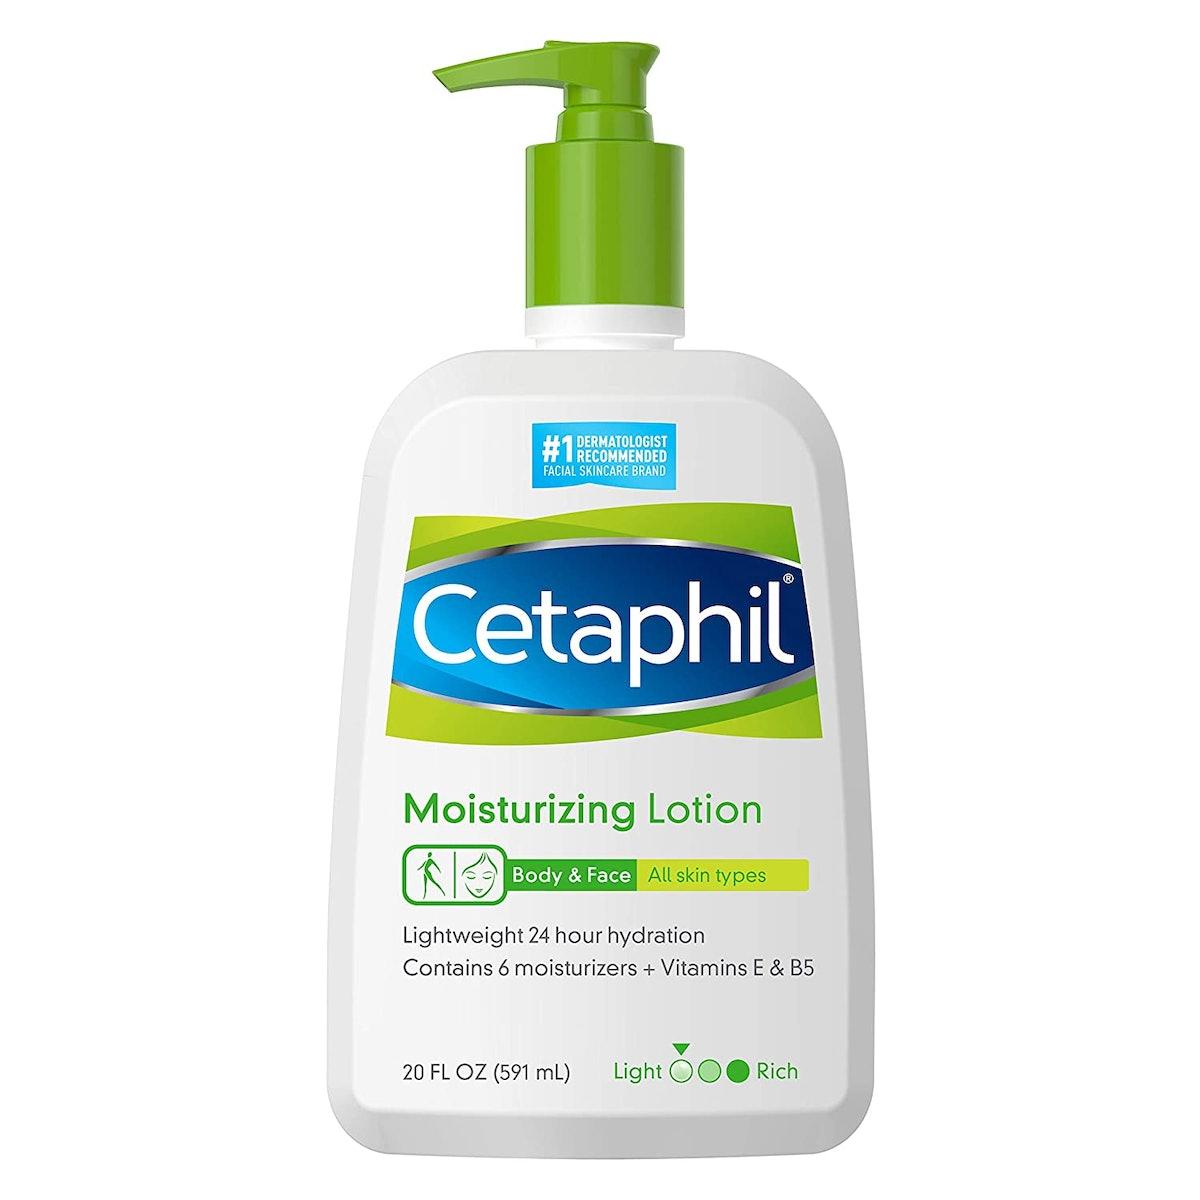 Cetaphil Moisturizing Lotion, 20 Fl Oz